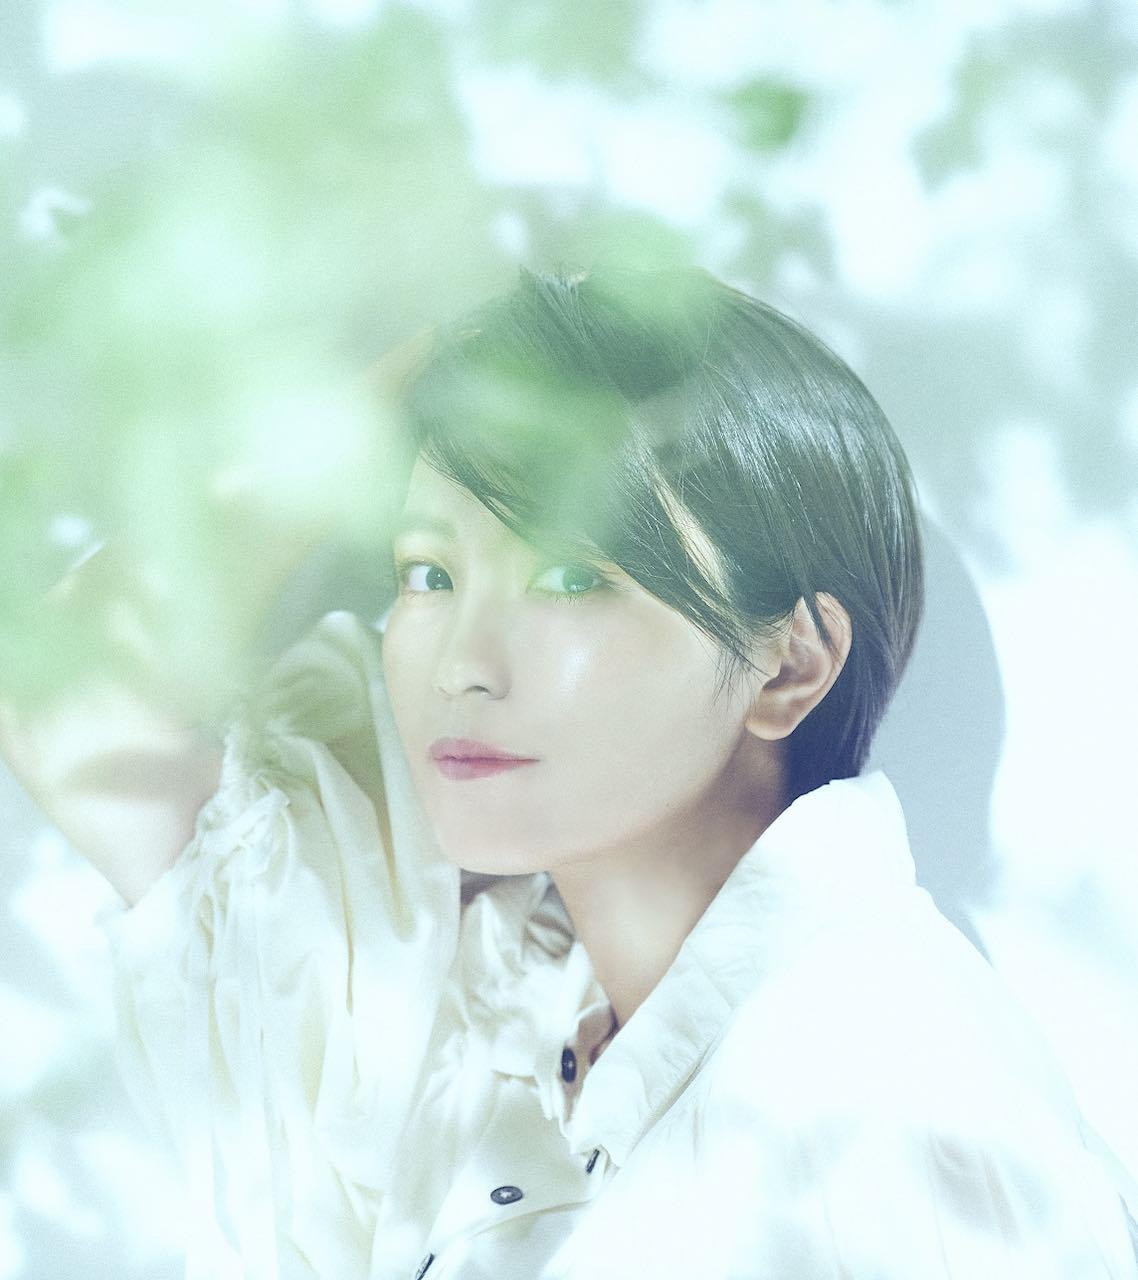 miwa、映画「総理の夫」主題歌『アイヲトウ』9月22日発売!詳細発表!